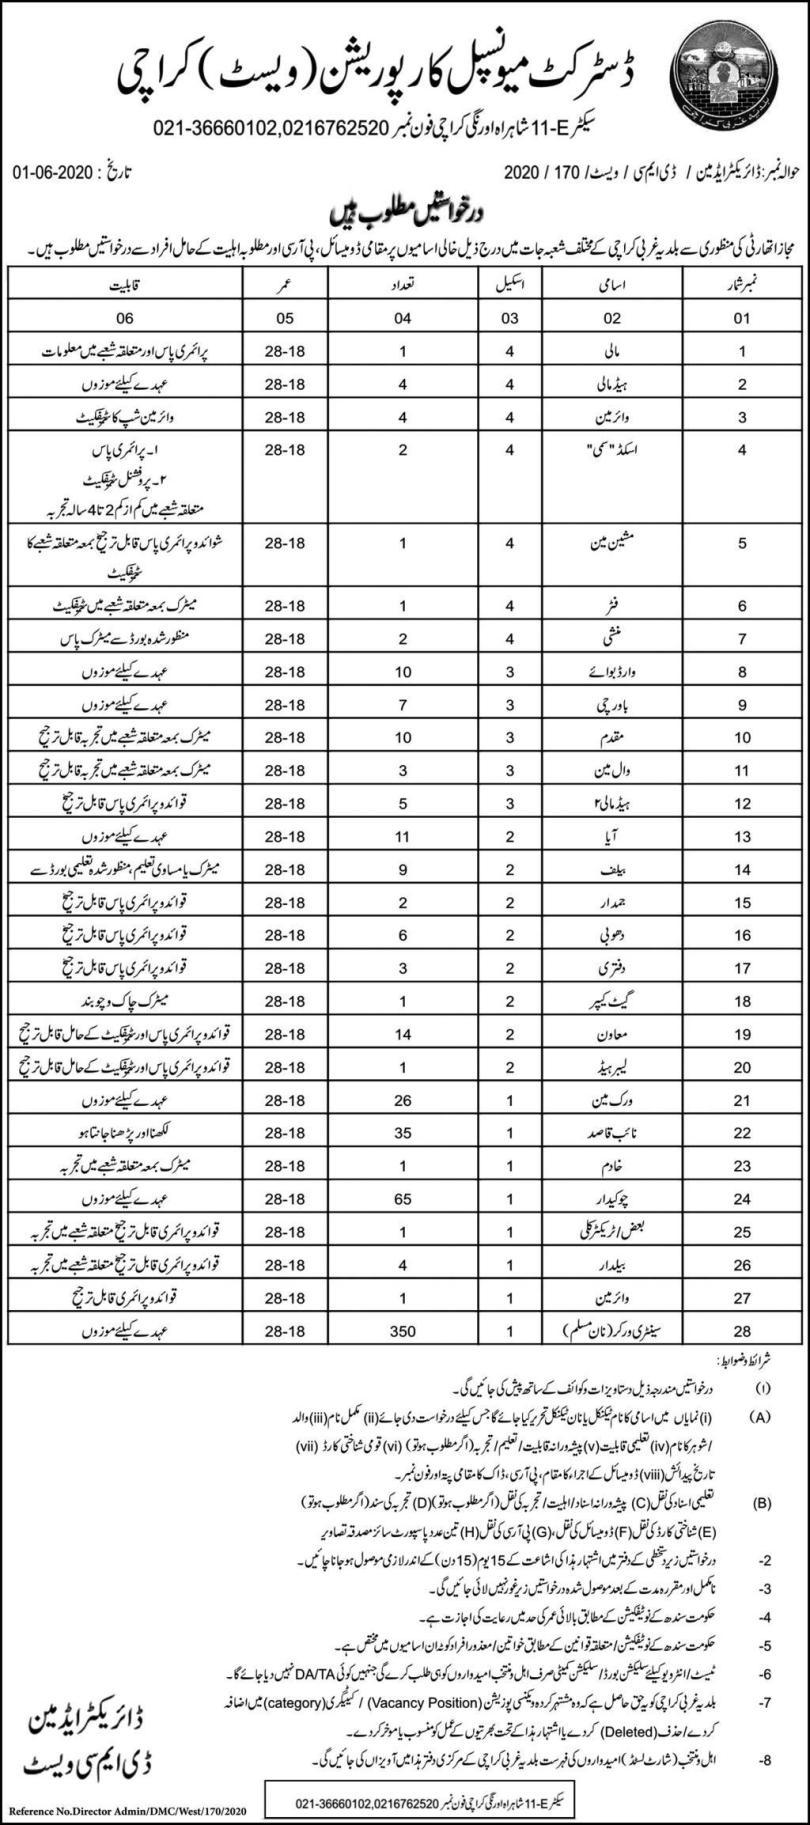 District Municipal Corporation DMC West Karachi Jobs Advertisement